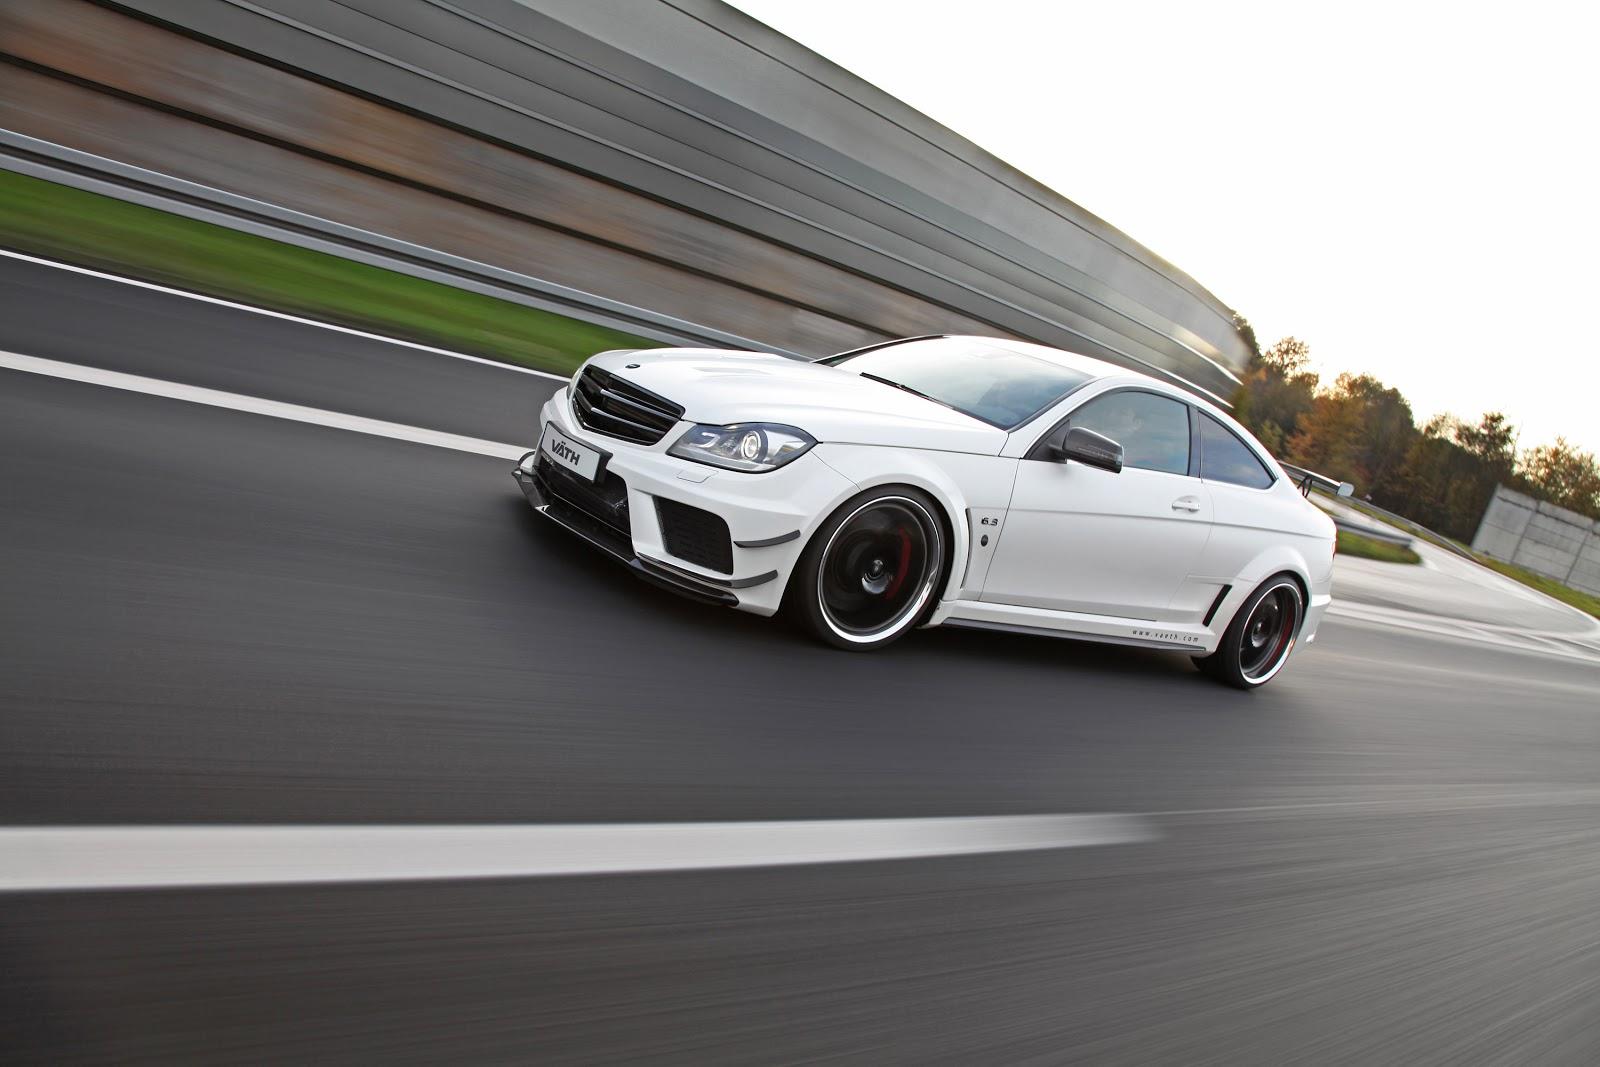 mercedes benz c63 amg black series - Mercedes Benz C63 Amg Black Series Wallpaper